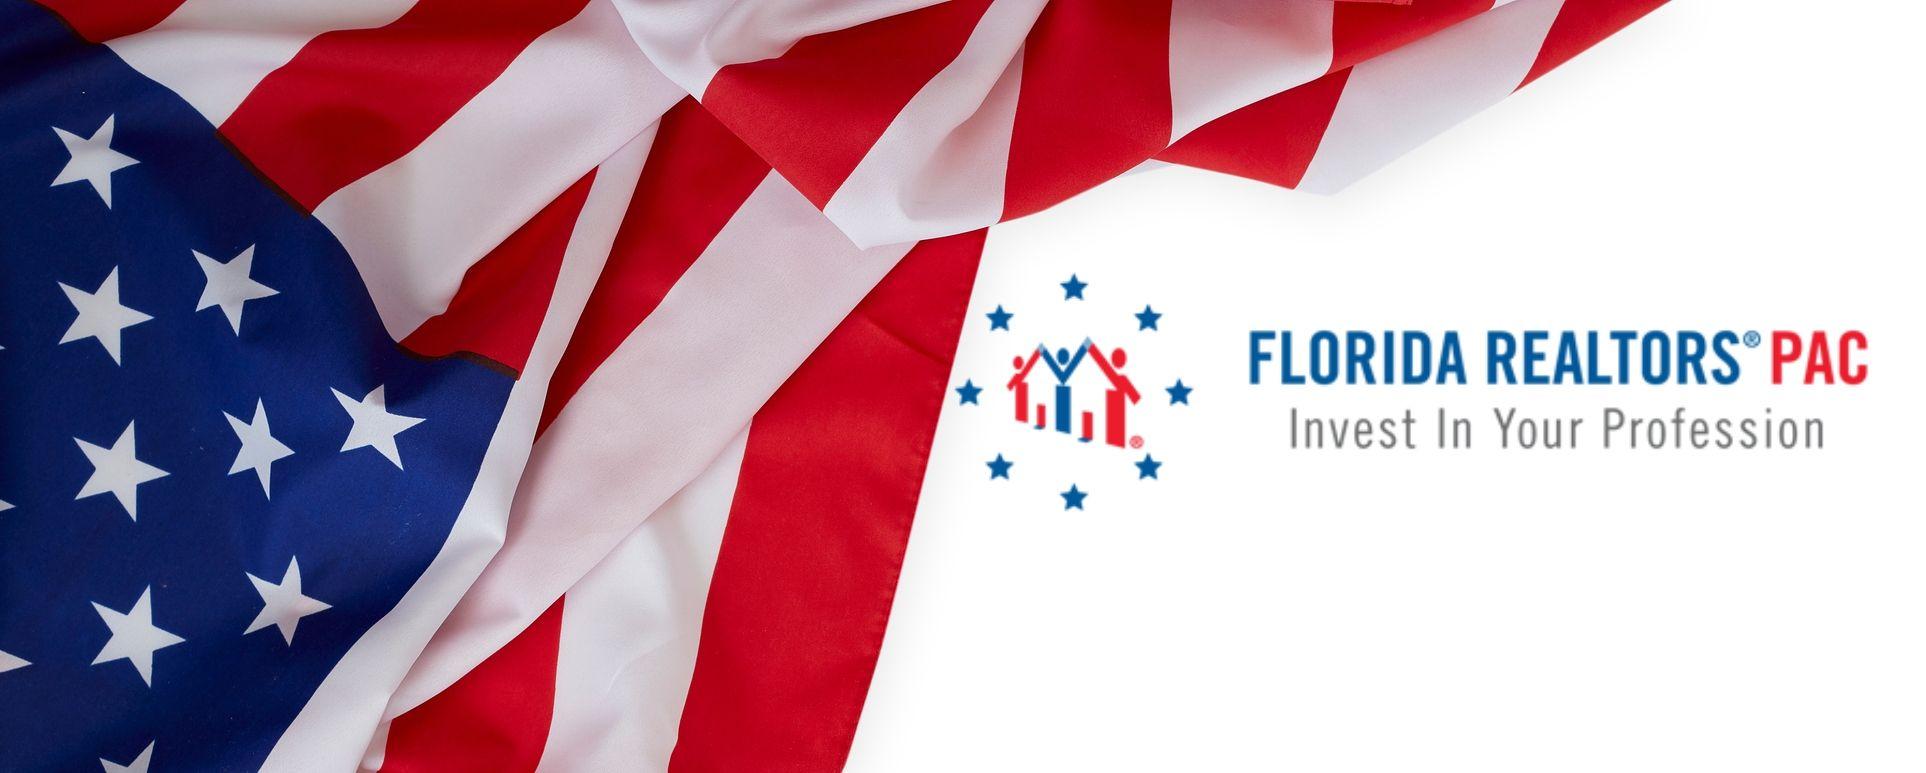 Legislative Update The Status of RE Bills in Florida